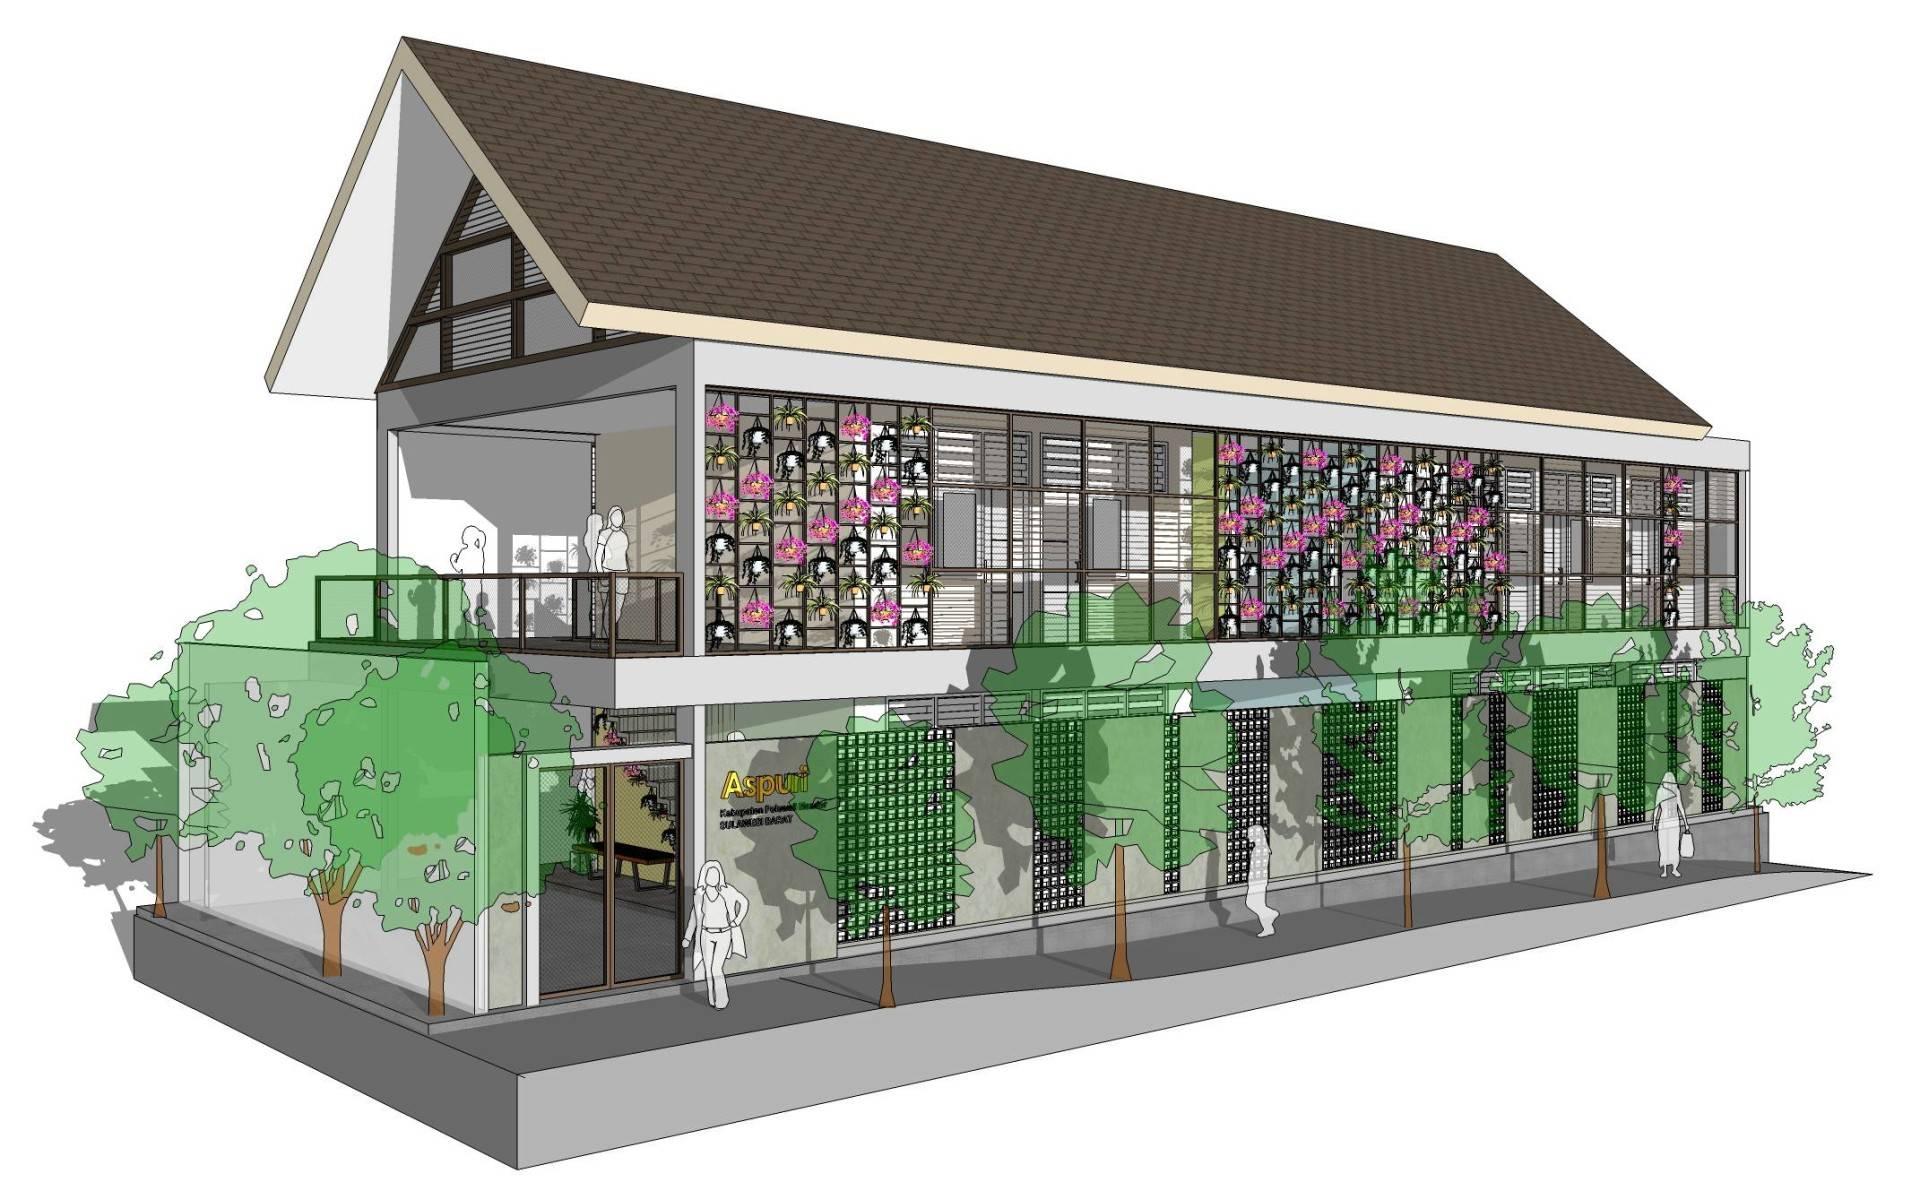 Miv Architects (Ar. Muhammad Ikhsan Hamiru, Iai & Partners) Asrama Mahasiswa Polewali Mandar Di Makassar | With Pt.dap Makassar, Sulawesi Selatan, Indonesia Makassar, Sulawesi Selatan, Indonesia Facade Tropis,modern  5022